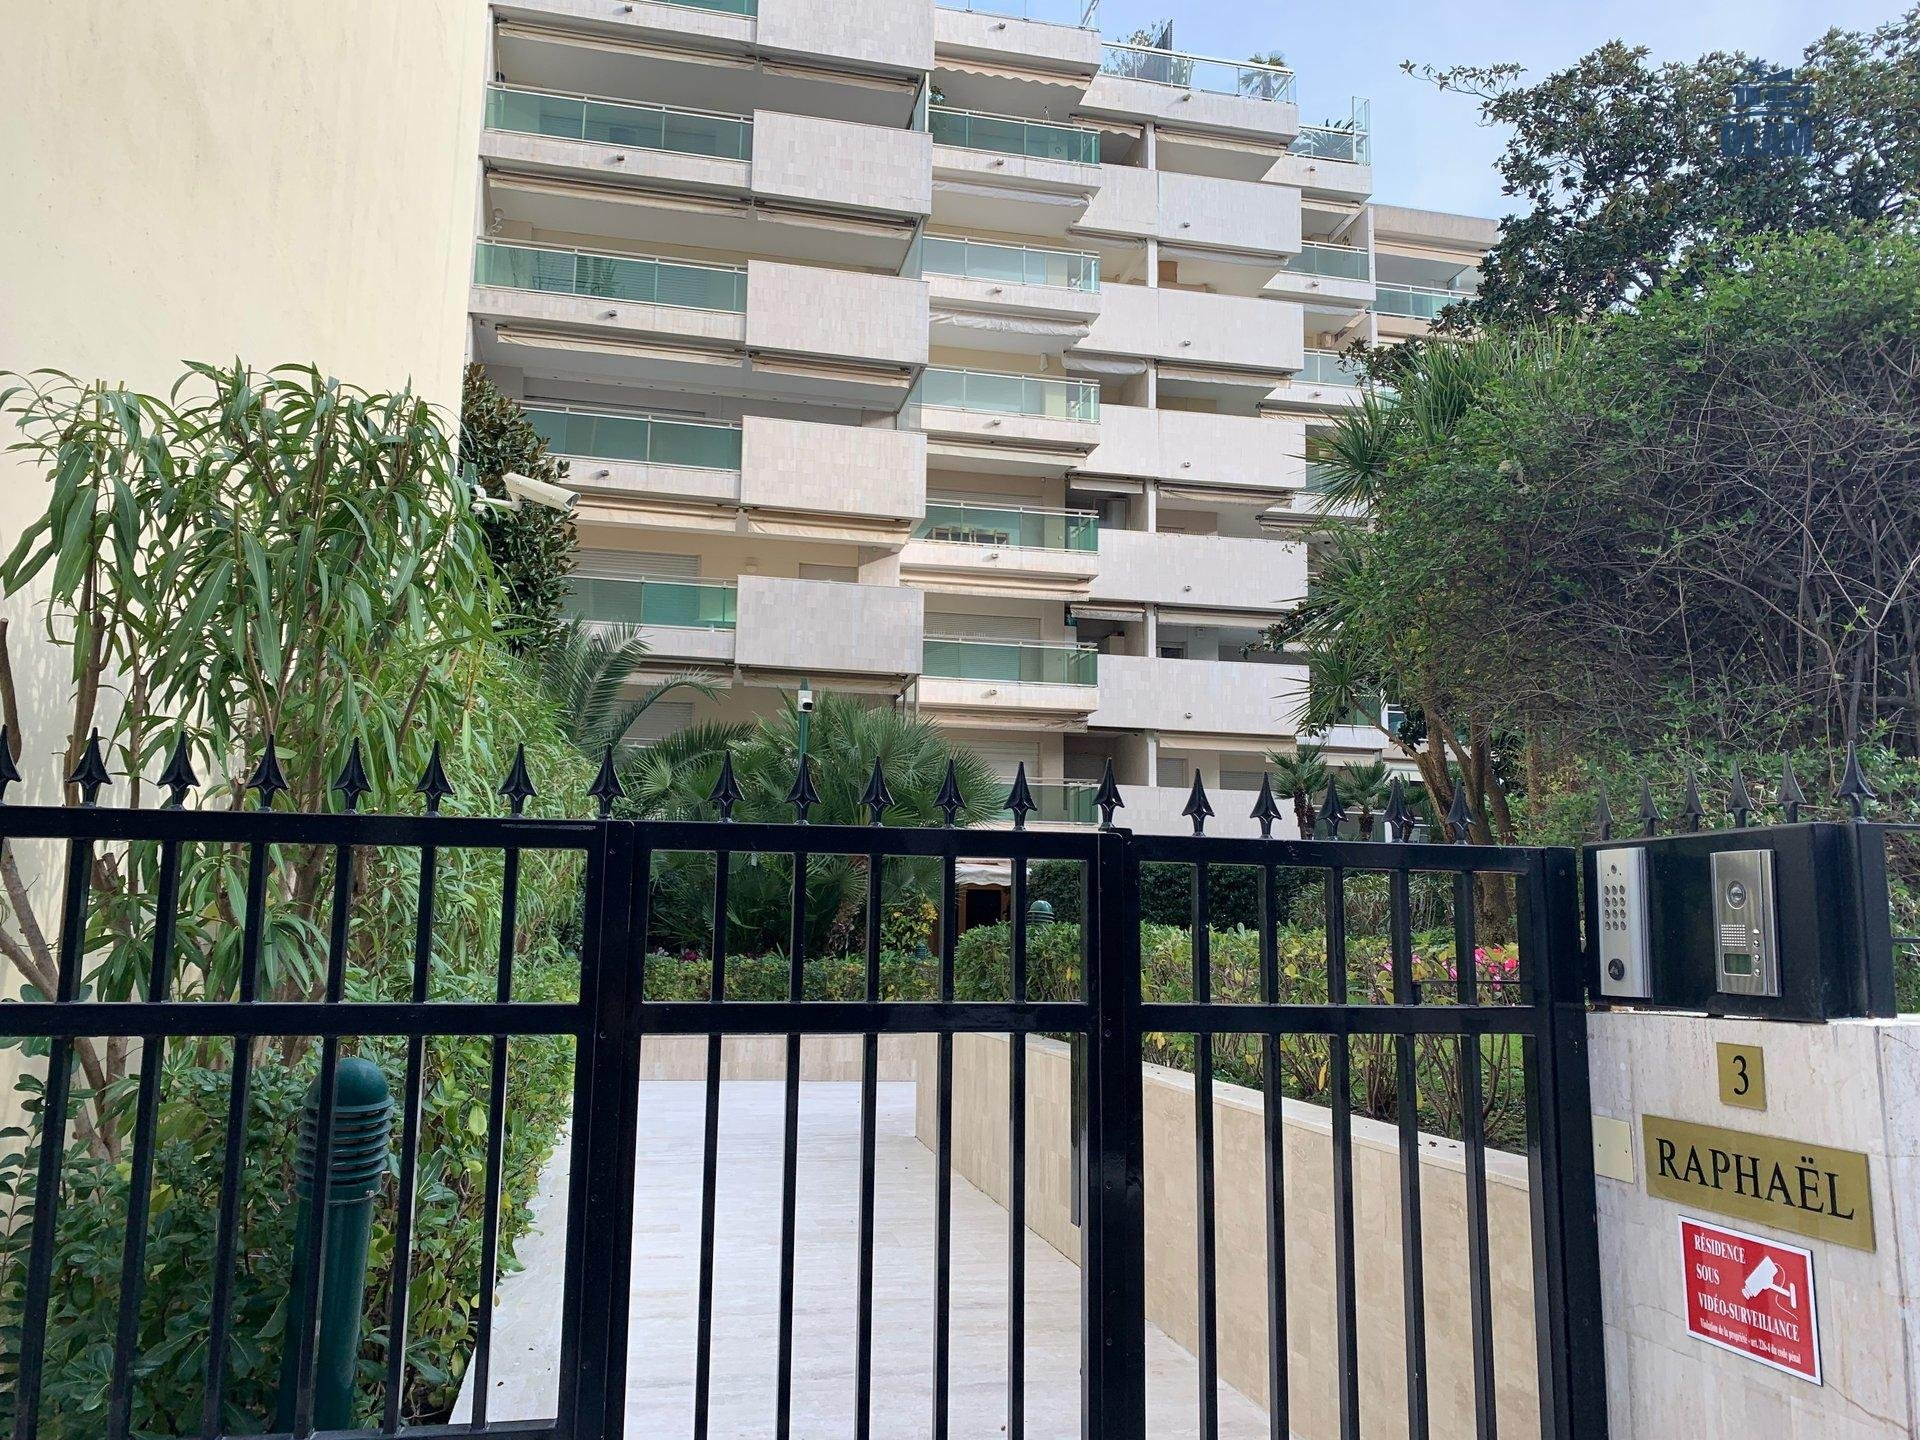 Facade, le Raphael, Cannes, Croisette, French Riviera, Seasonal rental